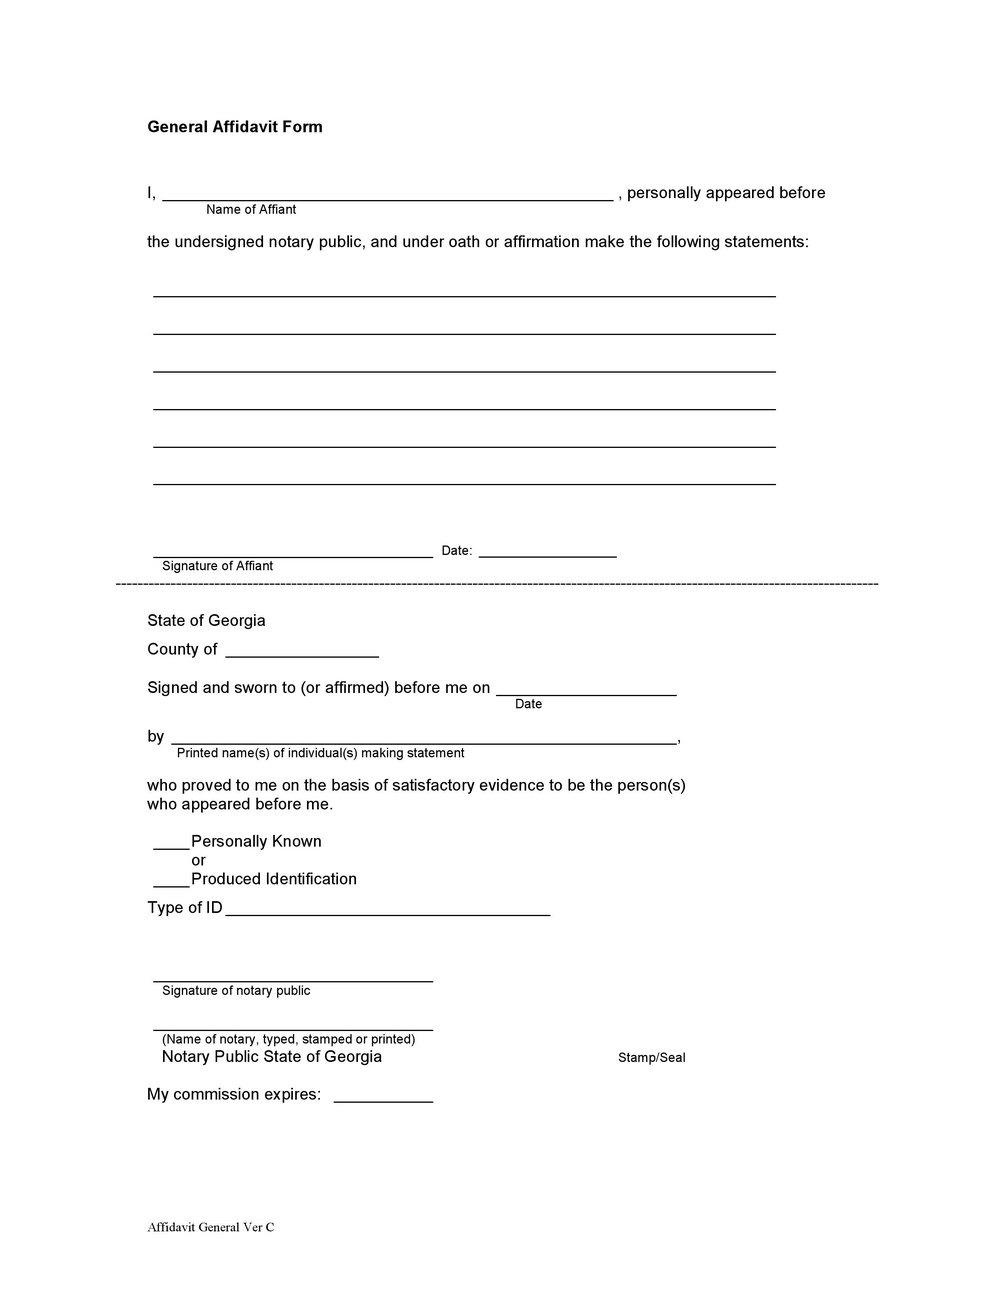 Notary Affidavit Format For Address Proof